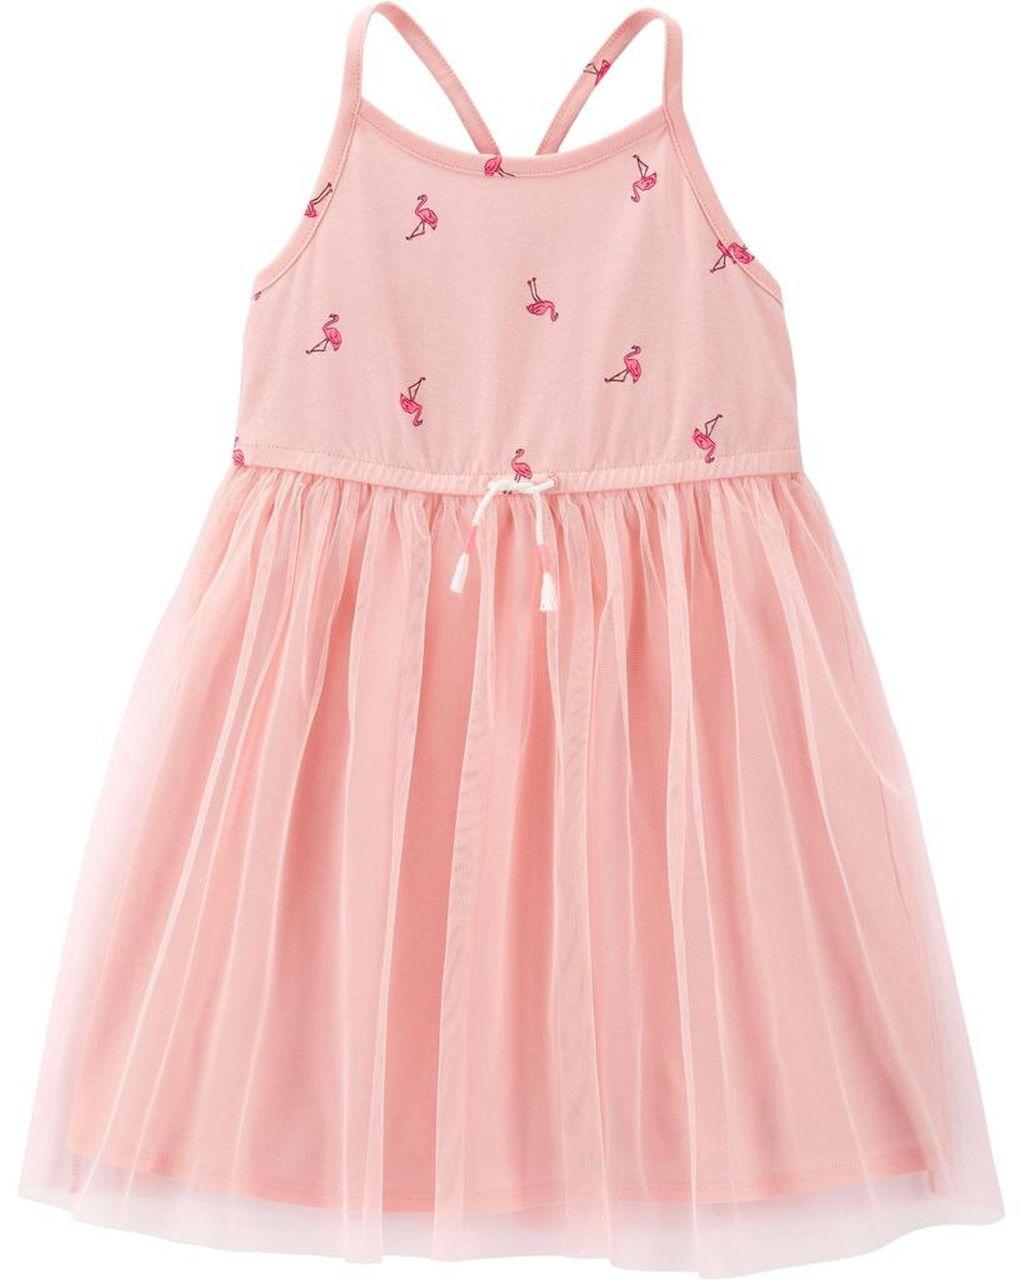 Vestido Tulle Flamingos Oshkosh